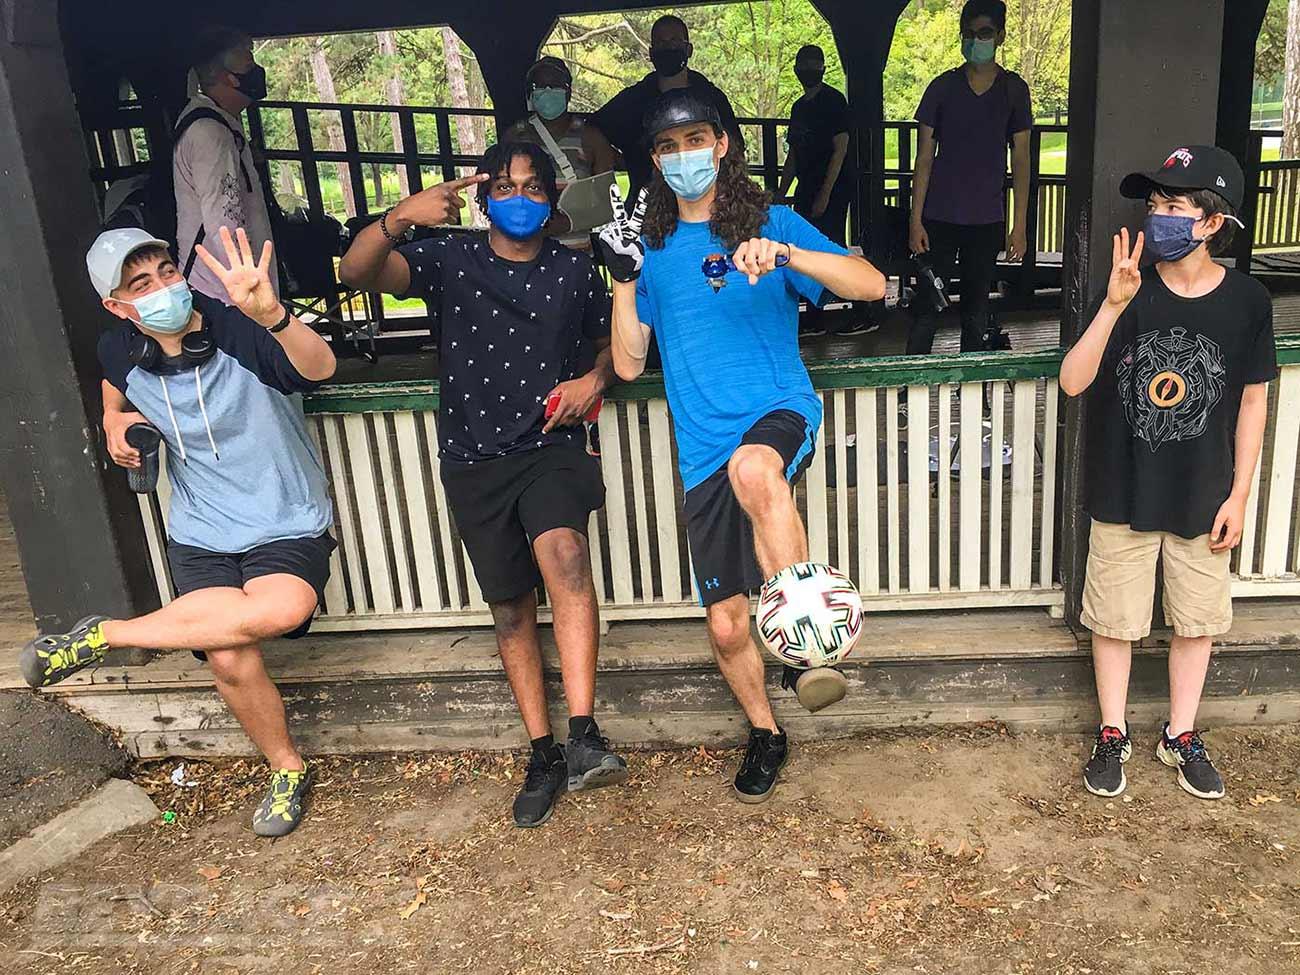 beyblade tournament winners group photo: henwooja1, justin tc, 1234beyblade, and bladerbeast